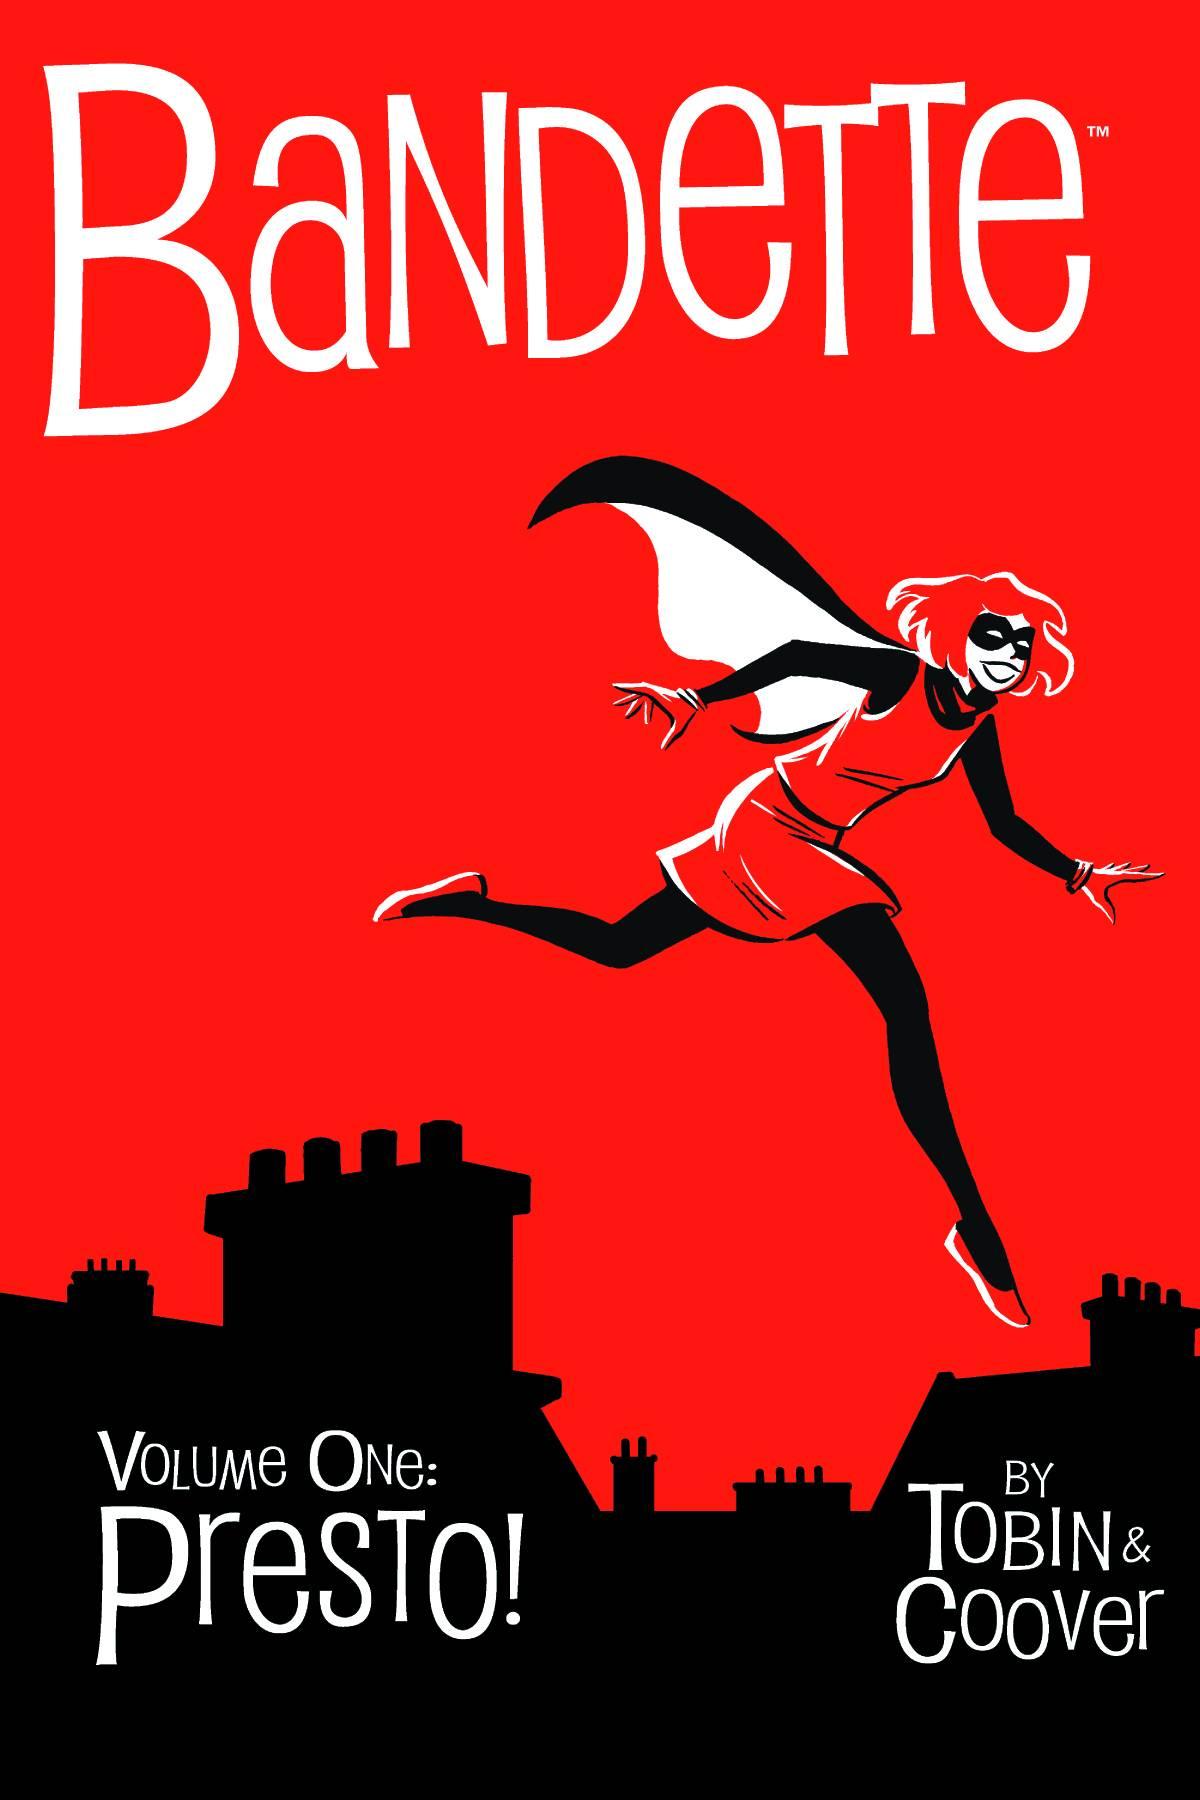 Bandette Volume 1: Presto! by Paul Tobin & Colleen Coover (Comic/Graphic Novel)  Amazon     Goodreads